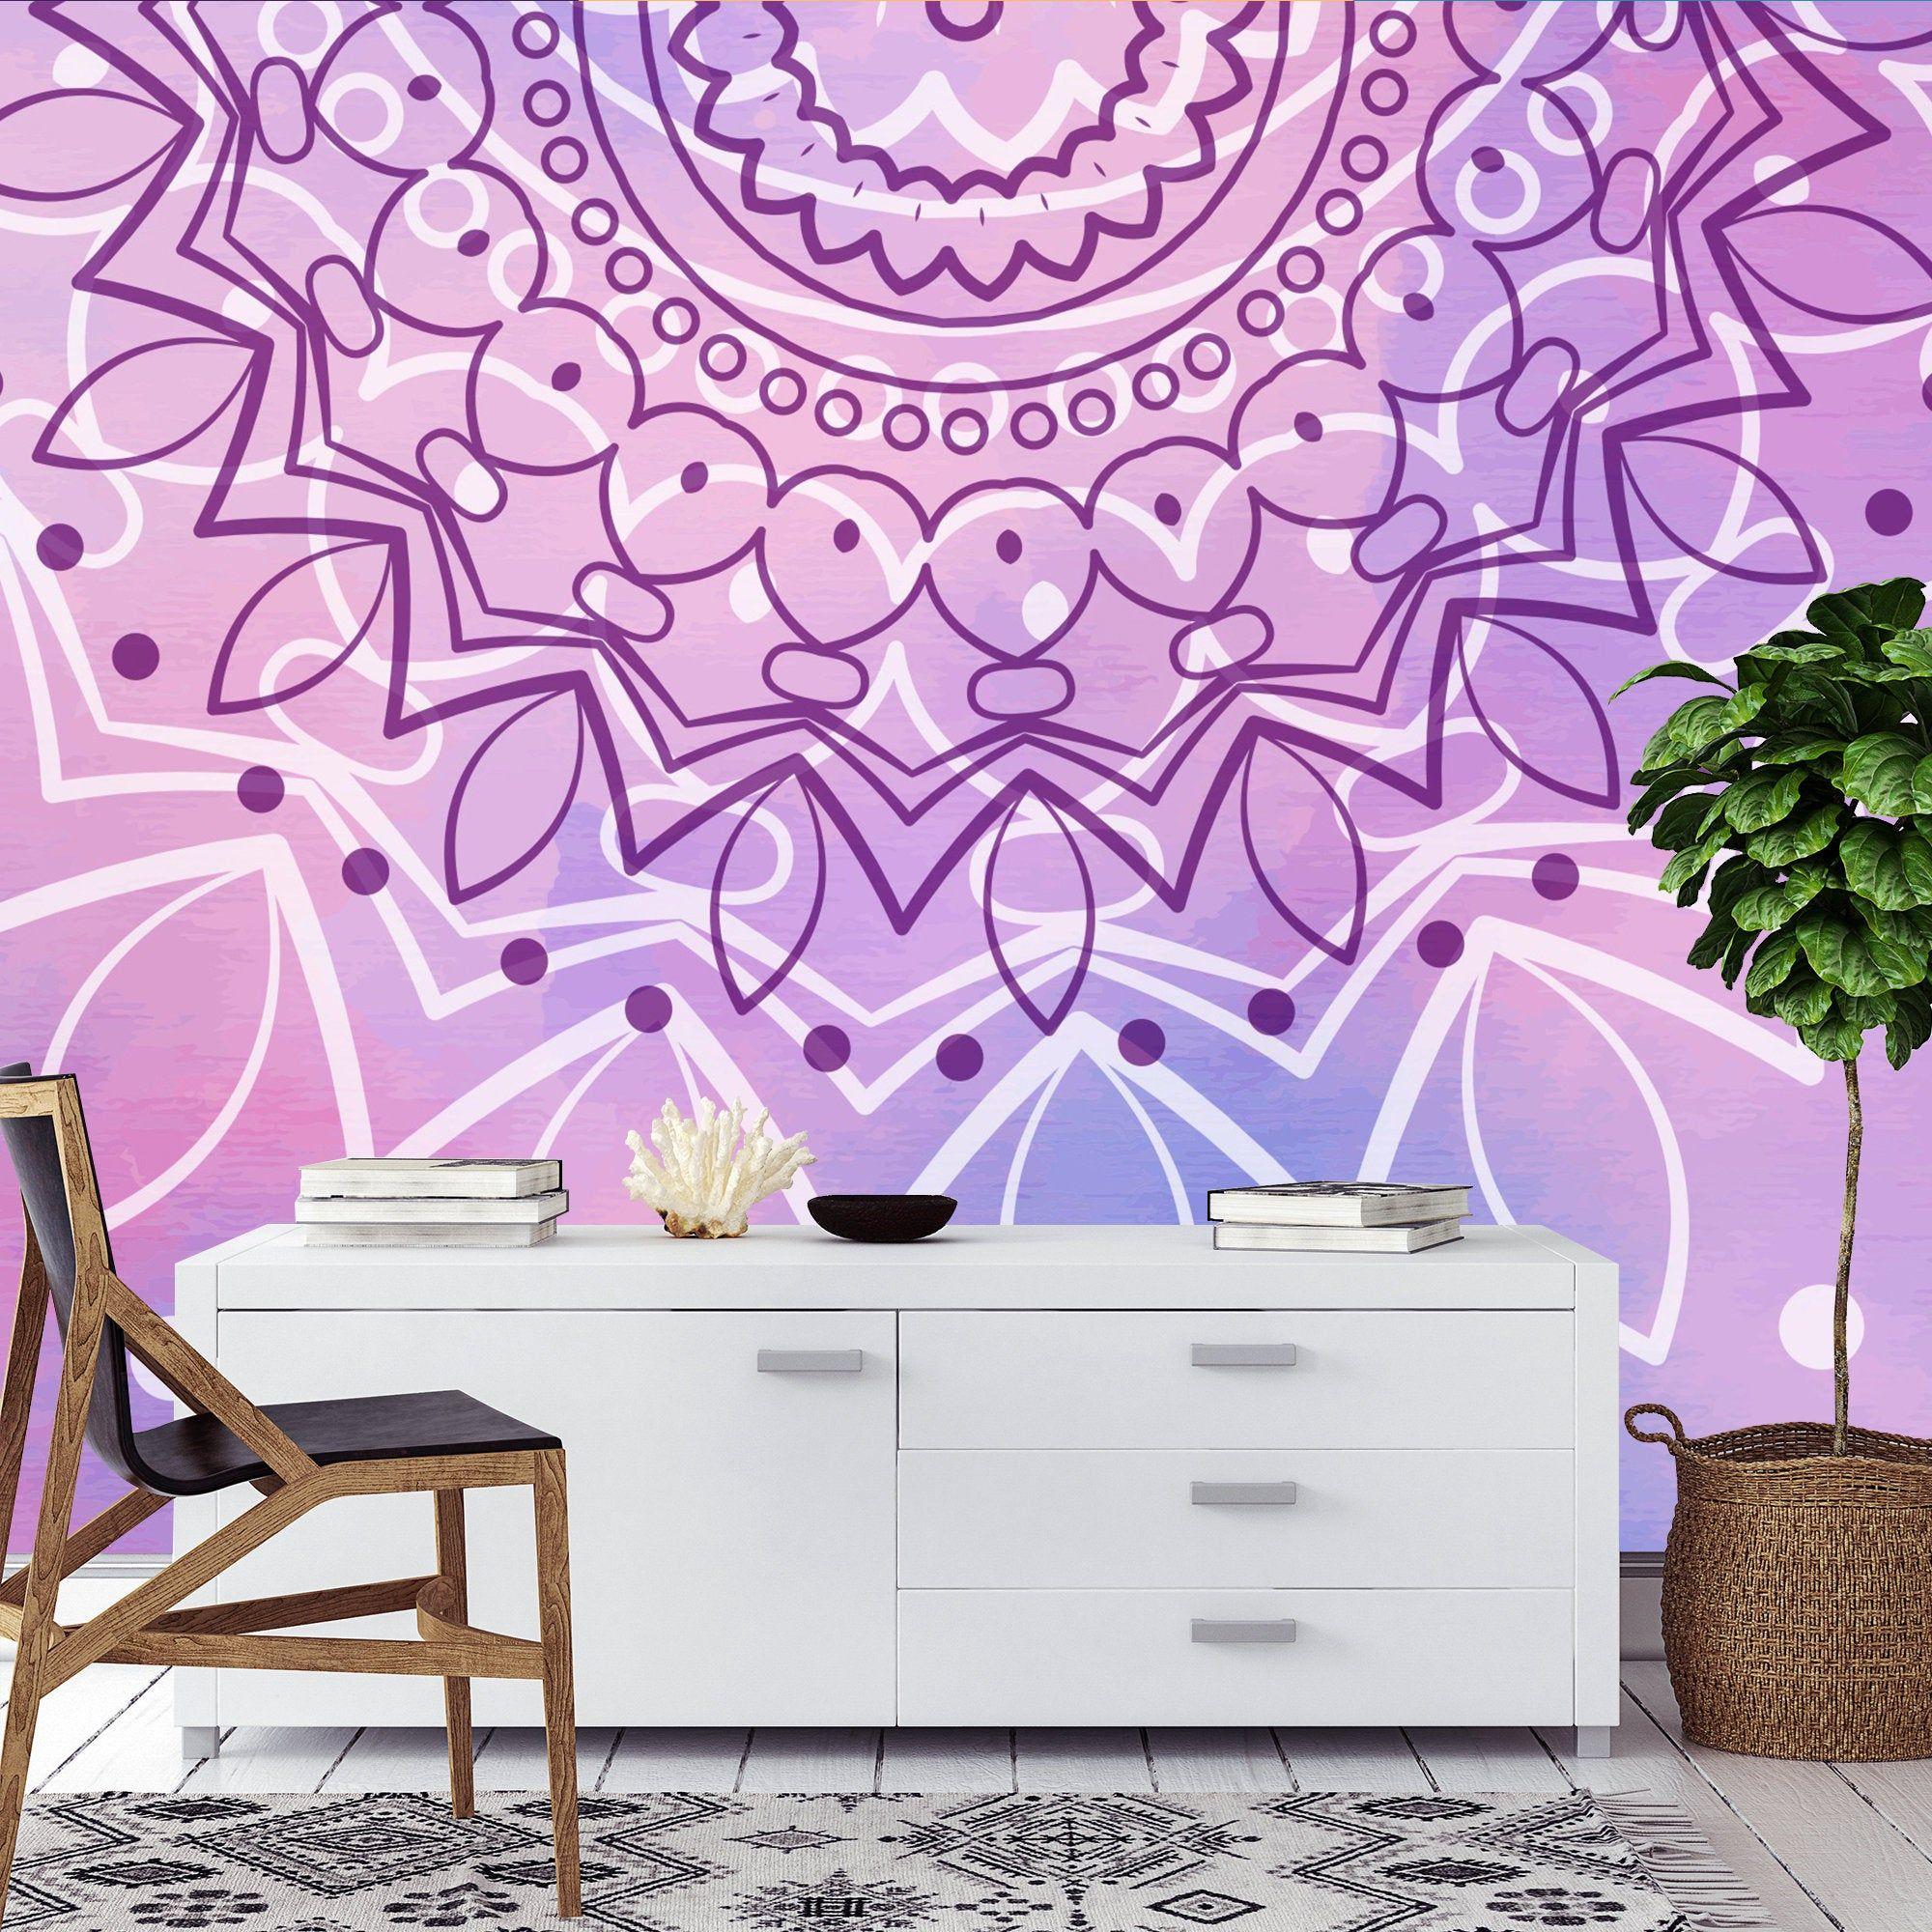 Mandala Wallpaper Removable Wallpaper In Purple Peel And Stick Wallpaper Self Adhesive Wall Mural 53 Mandala Wallpaper Removable Wallpaper Mural Wallpaper